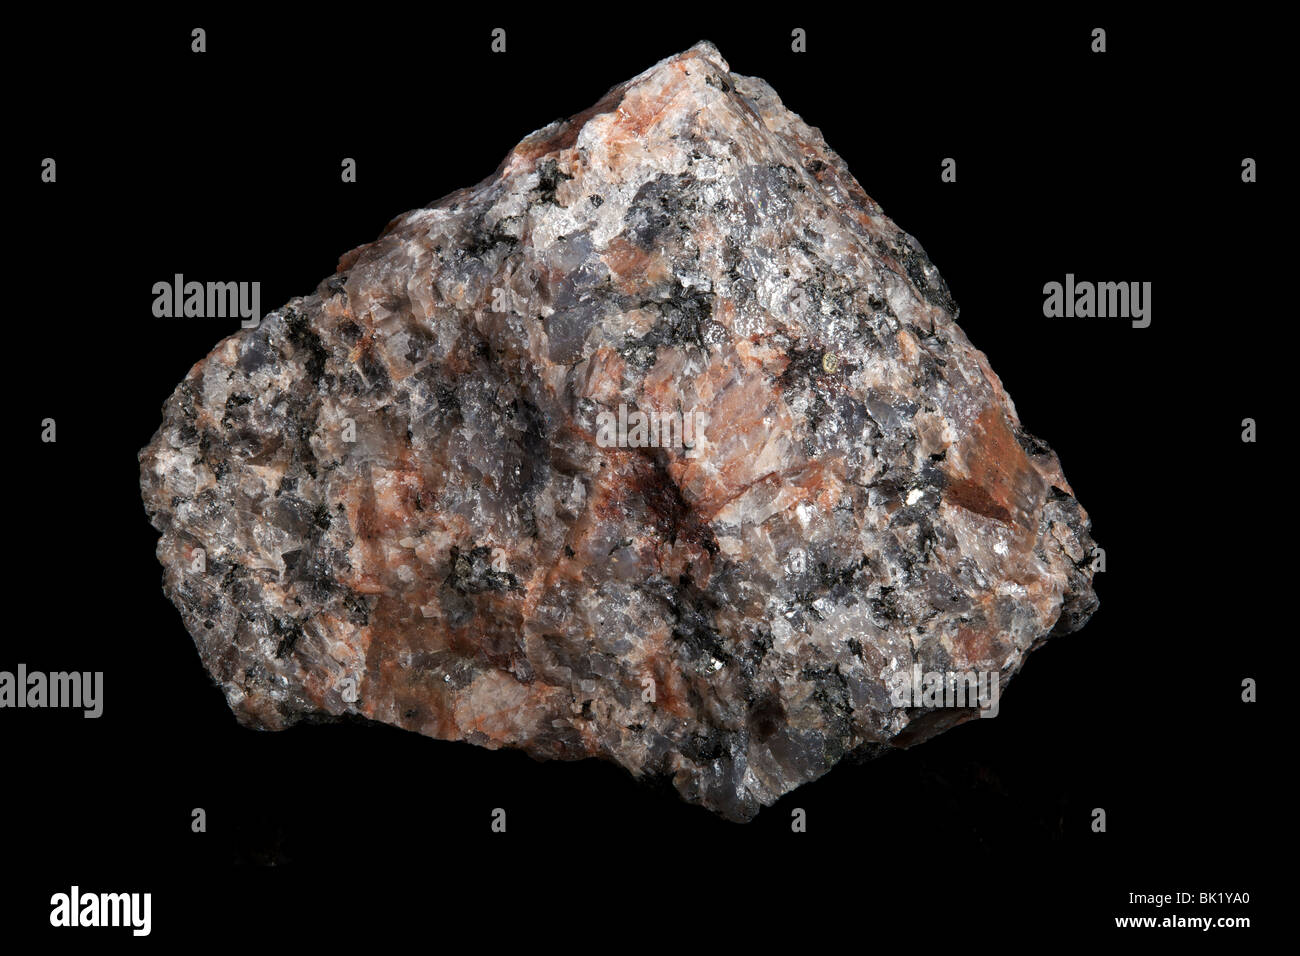 Coarse-grained Granite (Igneous Rock) - Stock Image